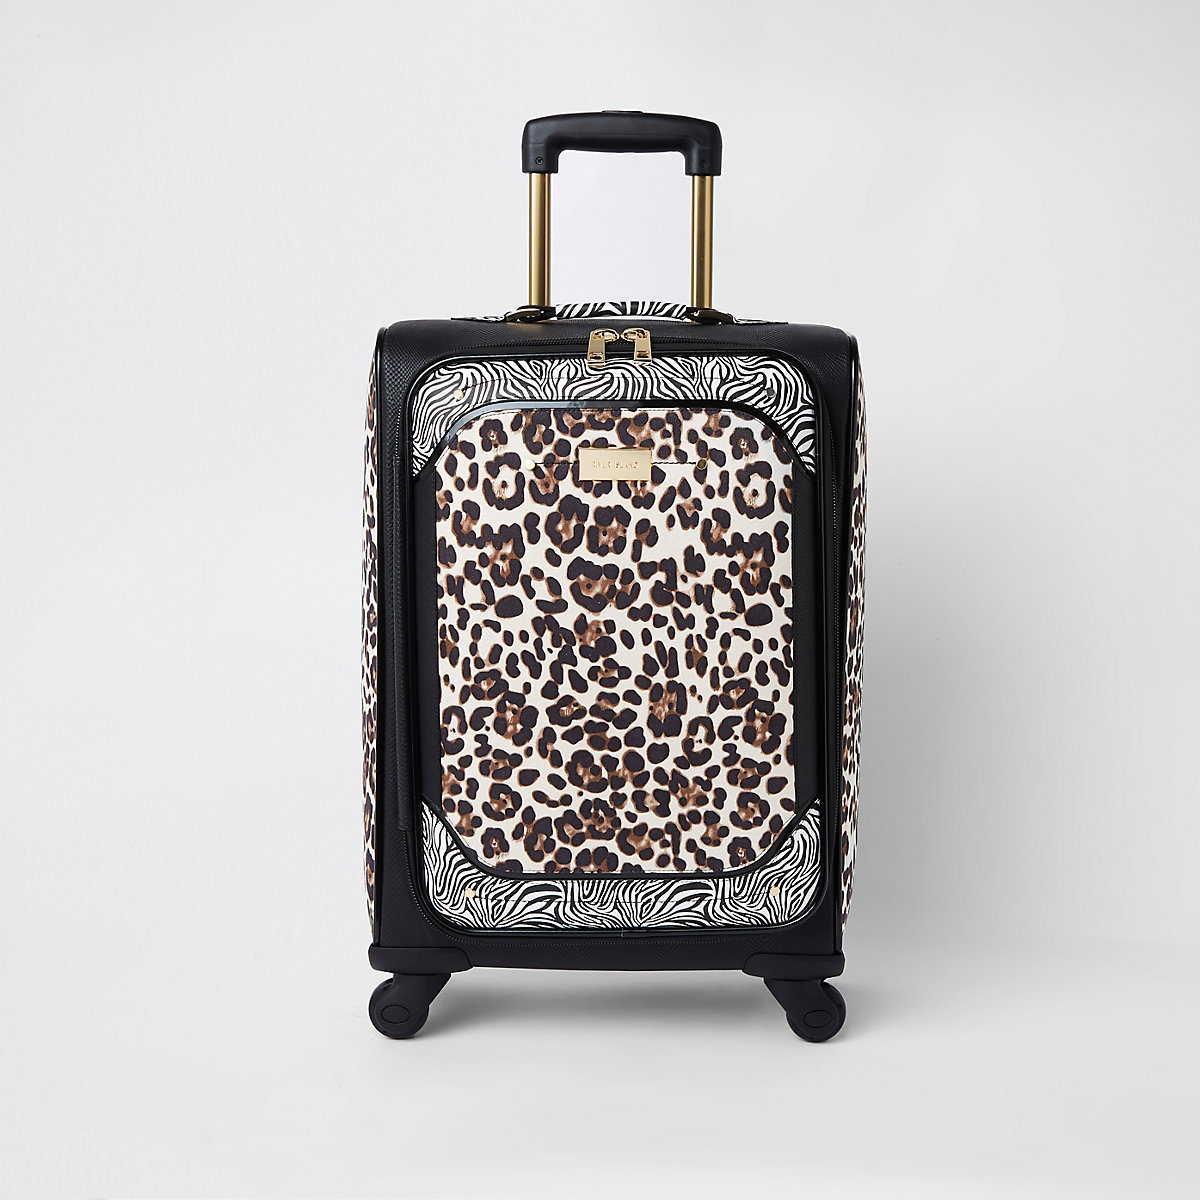 Zwarte koffer met vier wielen en dierenprint